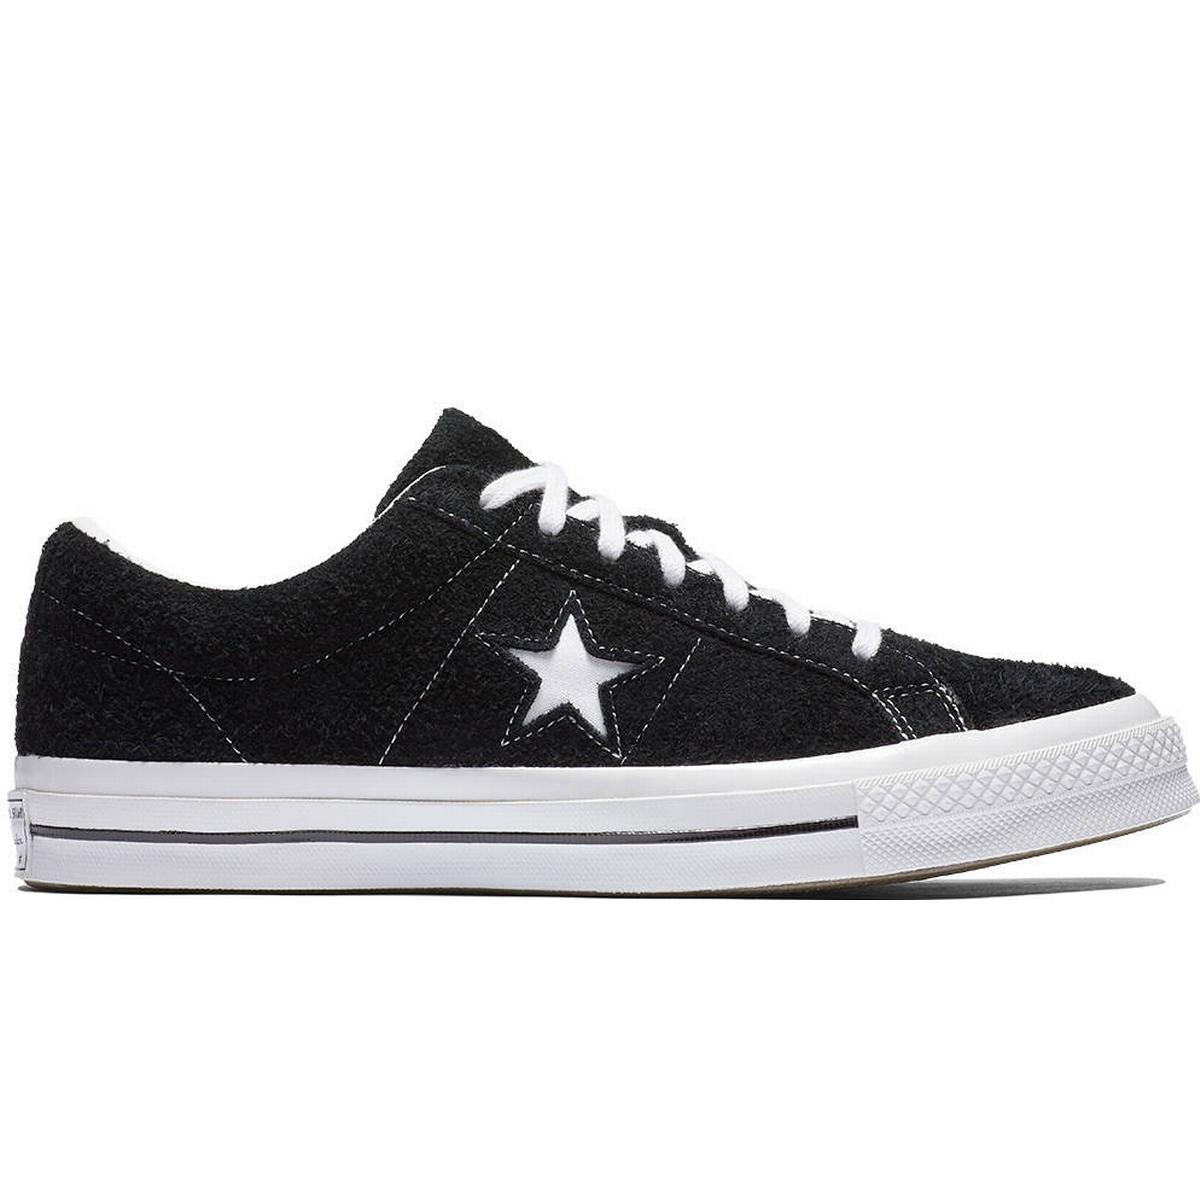 Converse One Star Skor (1000+ produkter) hos PriceRunner